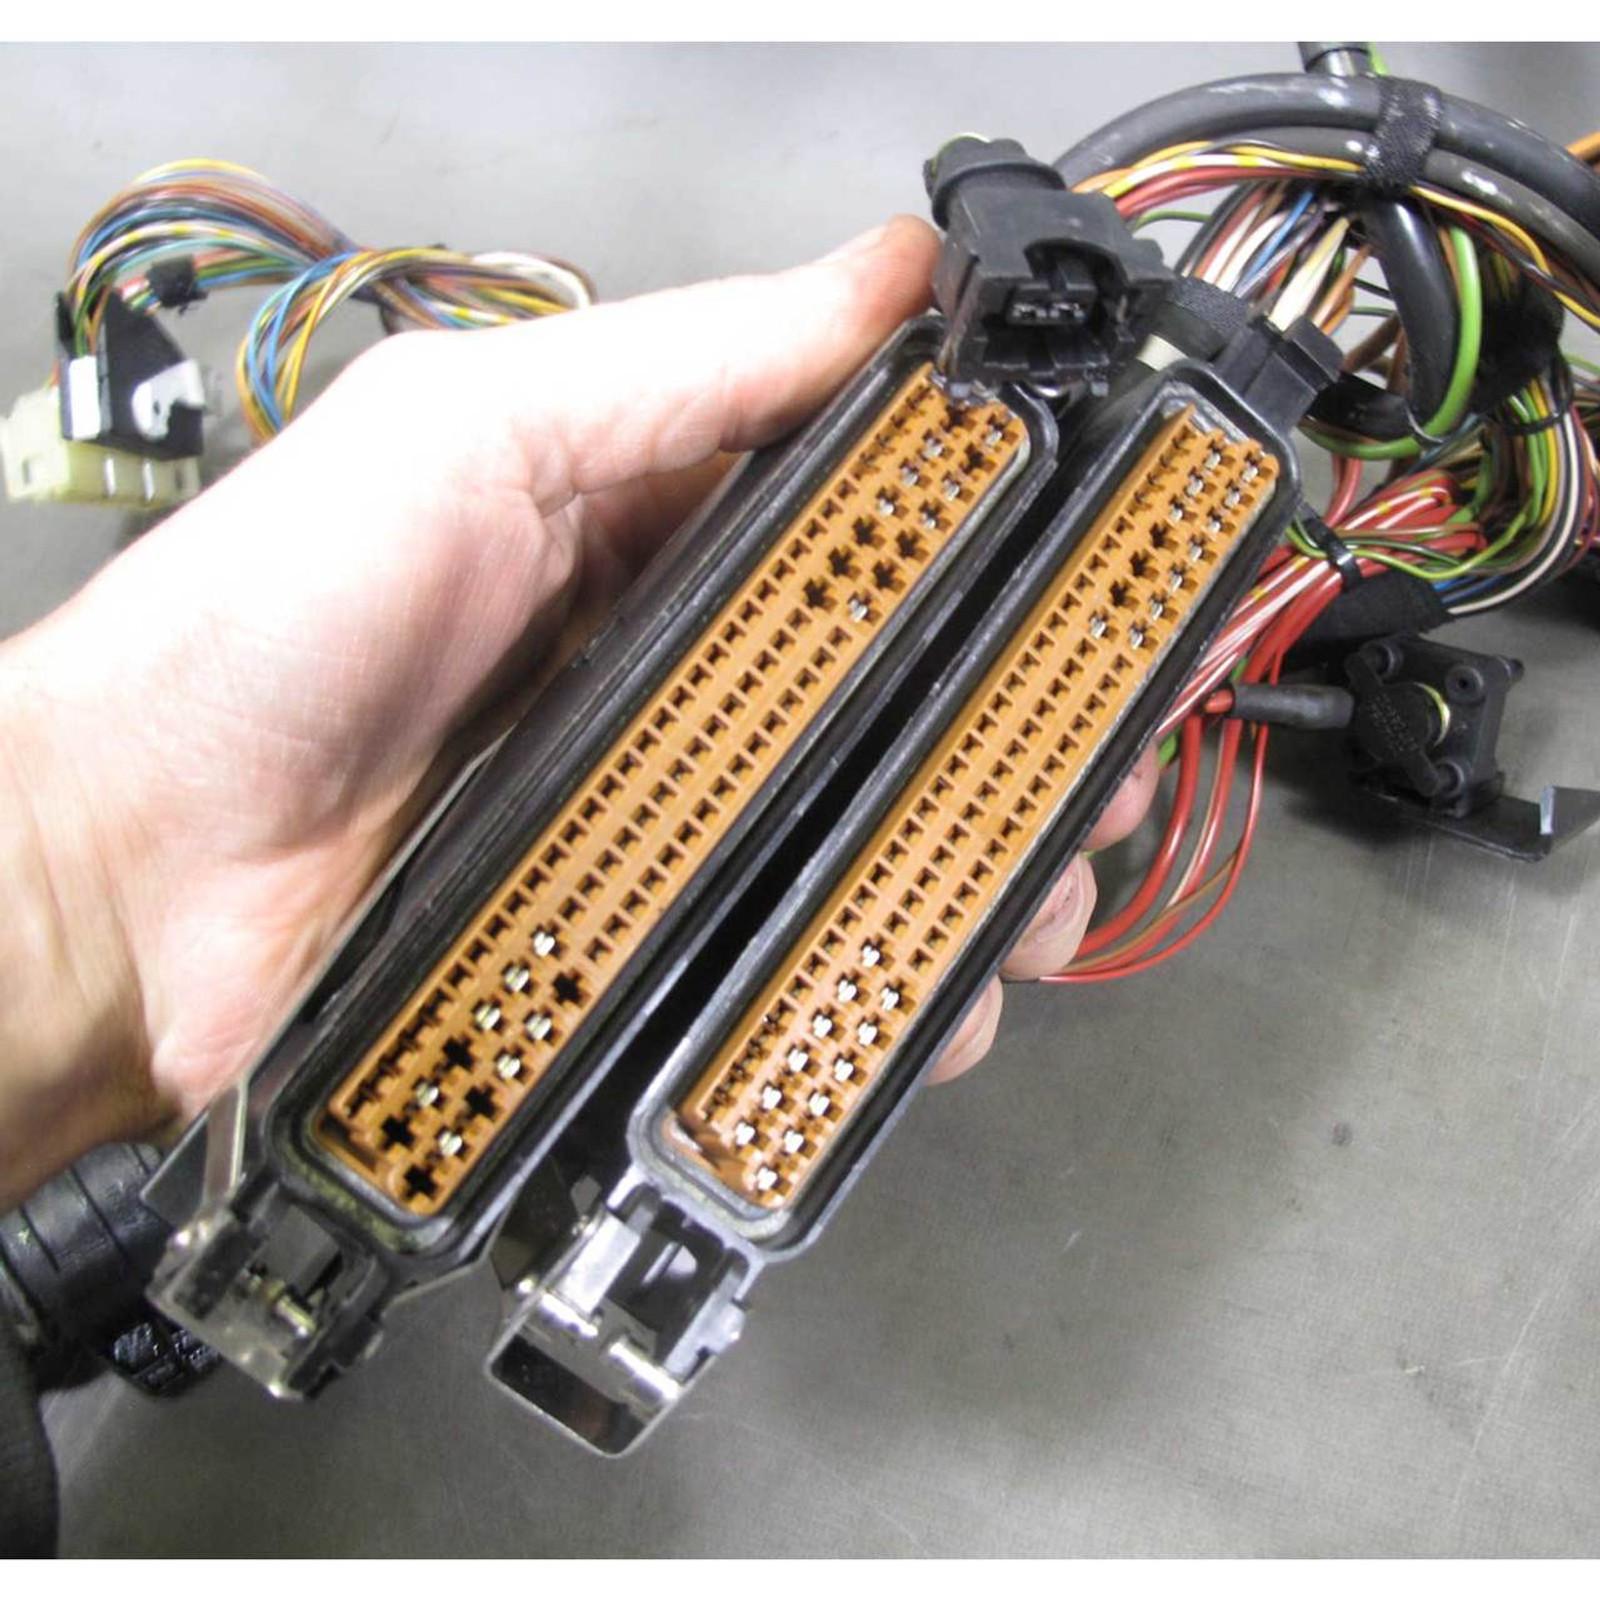 bmw e39 wiring loom wiring diagram experts wiring diagram bmw e39 1997 [ 1600 x 1600 Pixel ]